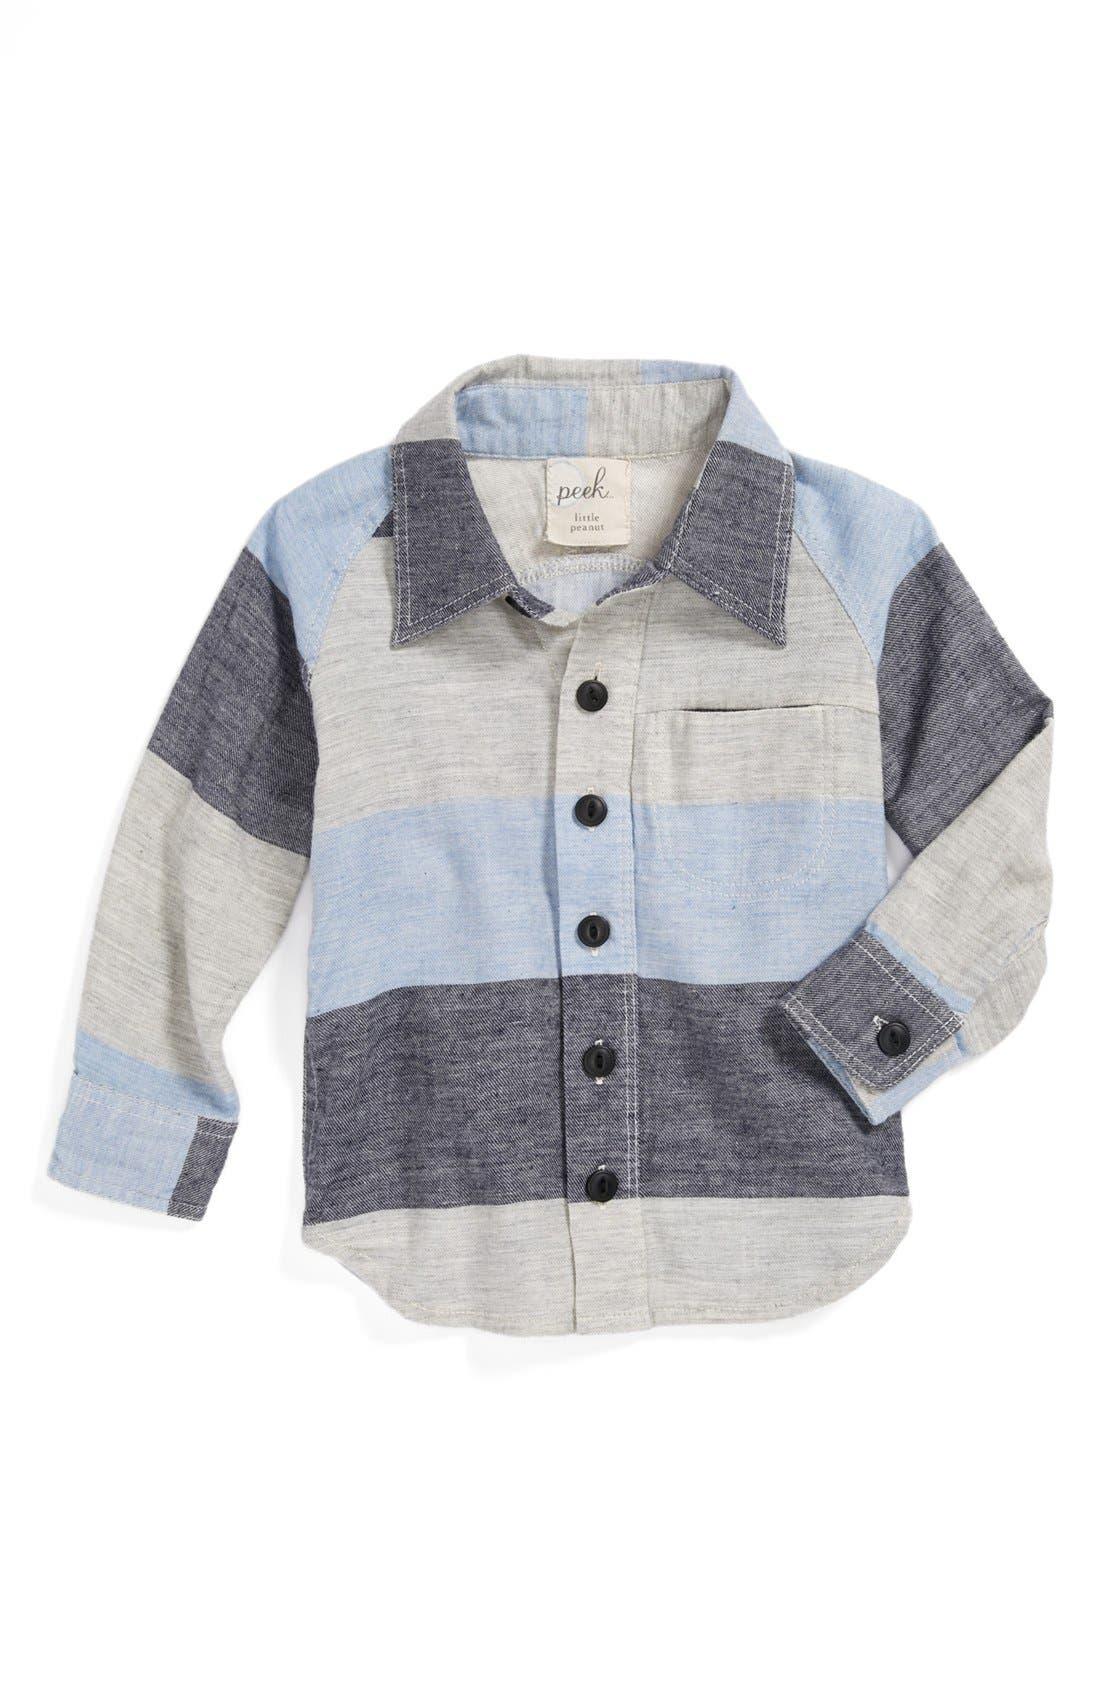 Alternate Image 1 Selected - Peek 'Juan' Stripe Shirt (Baby Boys)